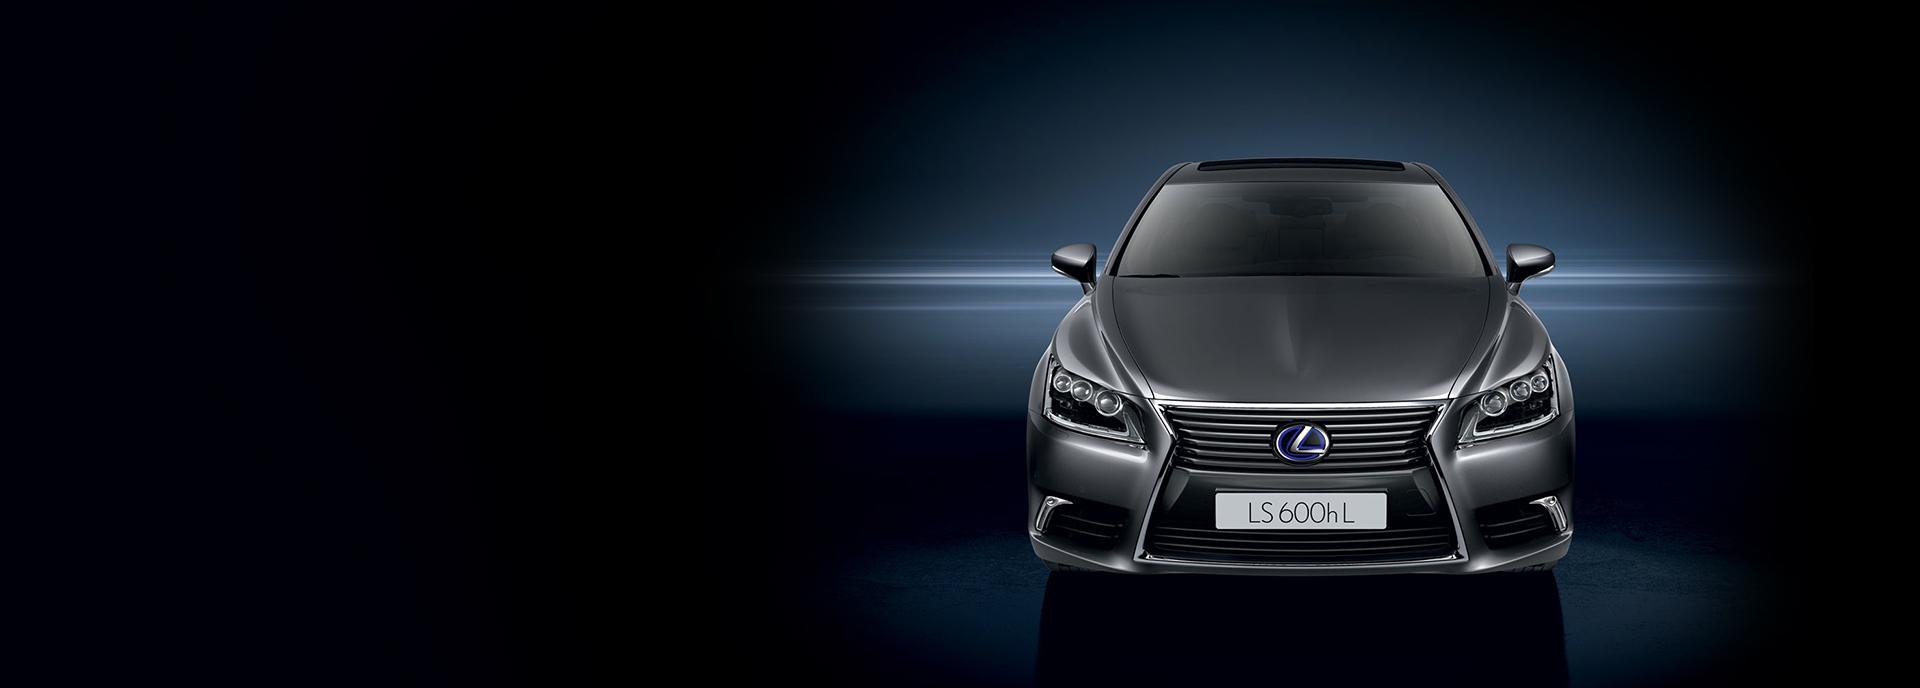 Rijdend zijaanzicht donkere Lexus LS 600h L